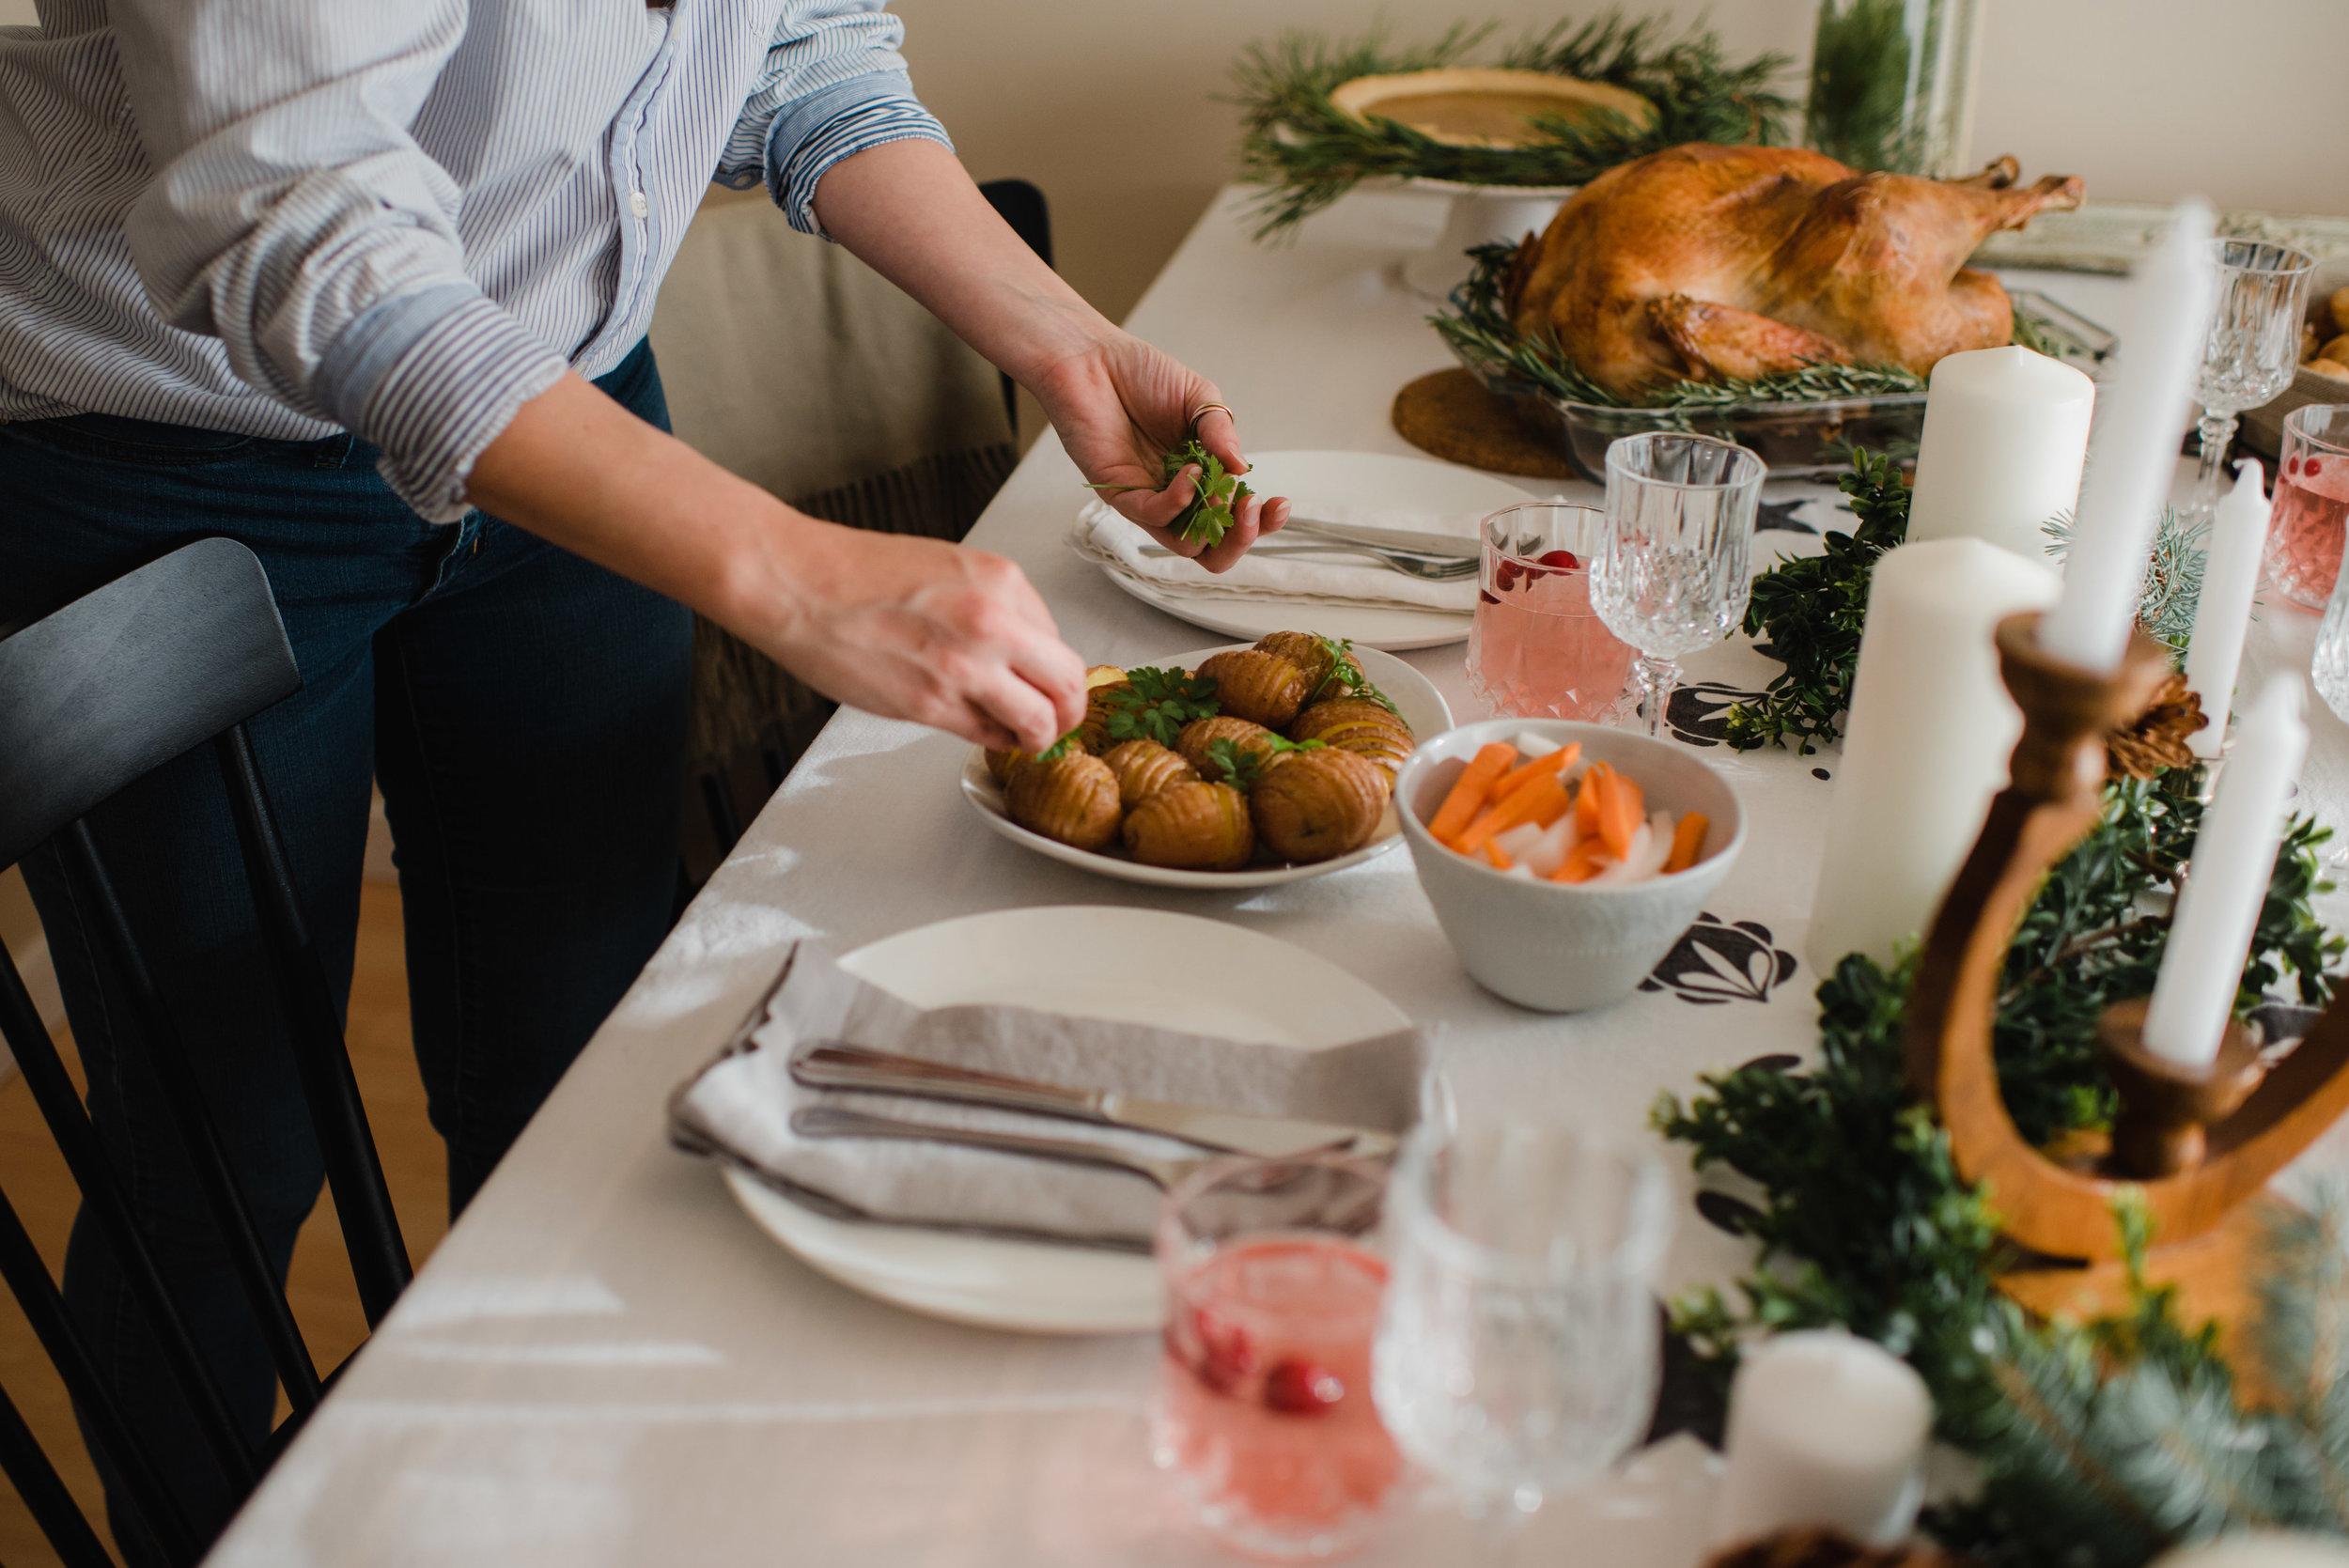 Hasselback Potatoes | Photo by Emilie Iggiotti | The Nomadic Wife